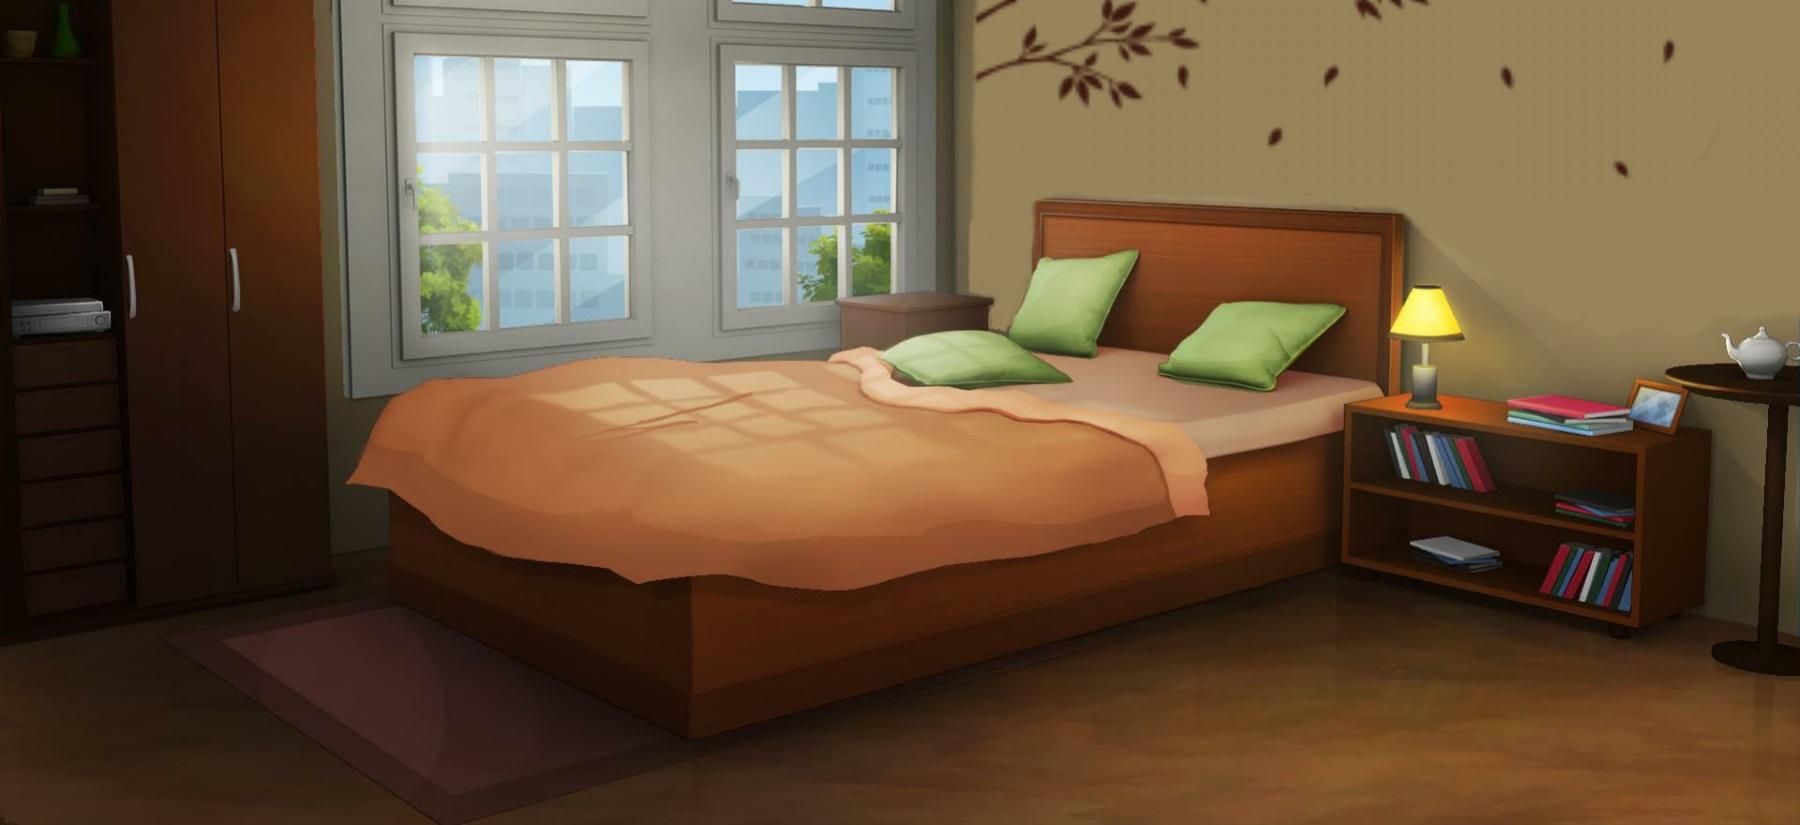 XL Background - Bedroom 05.jpg